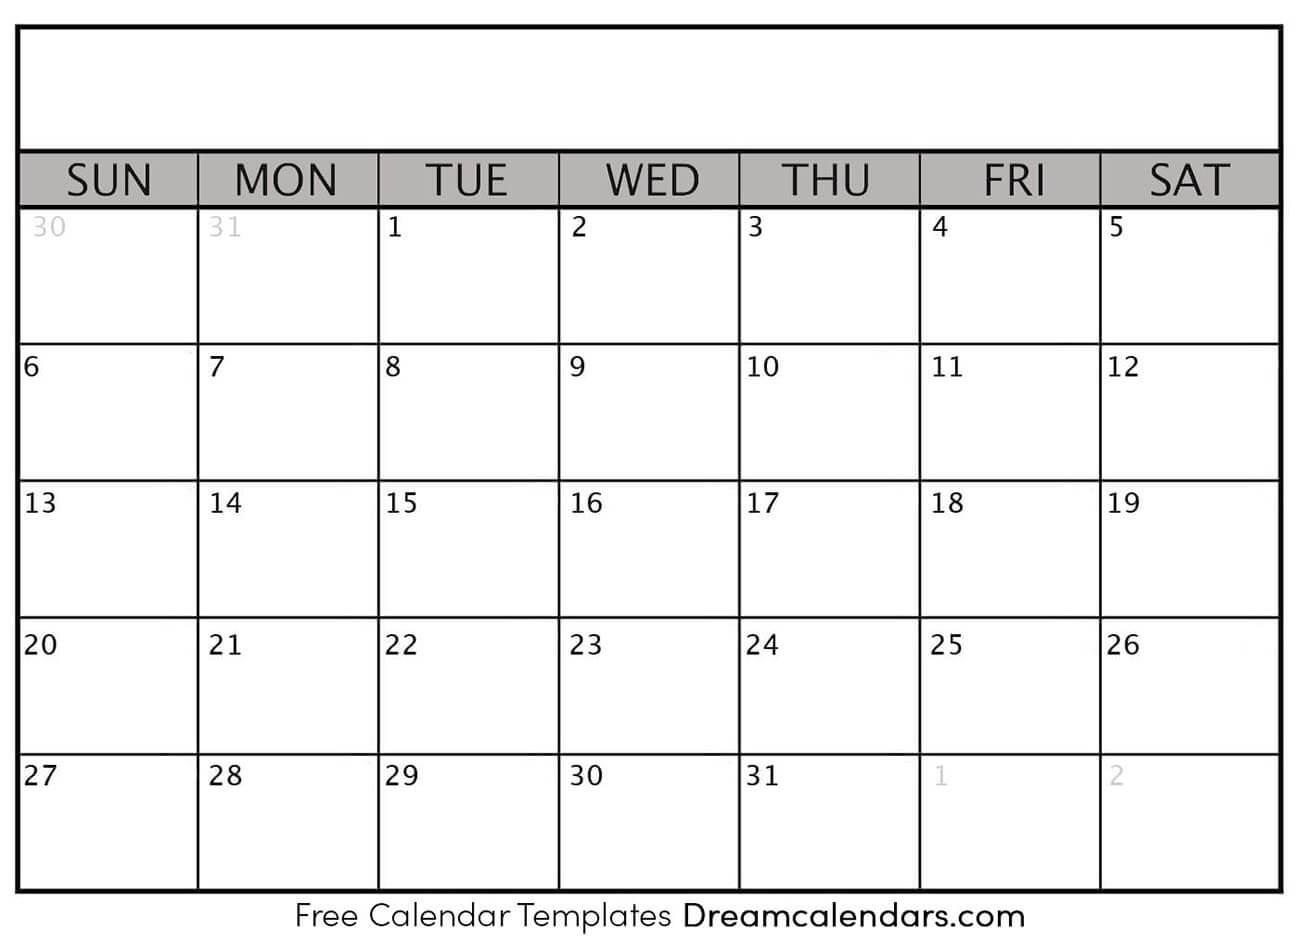 Printable Blank Calendar 2020 | Dream Calendars-Print Blank Calander Microsoft 365